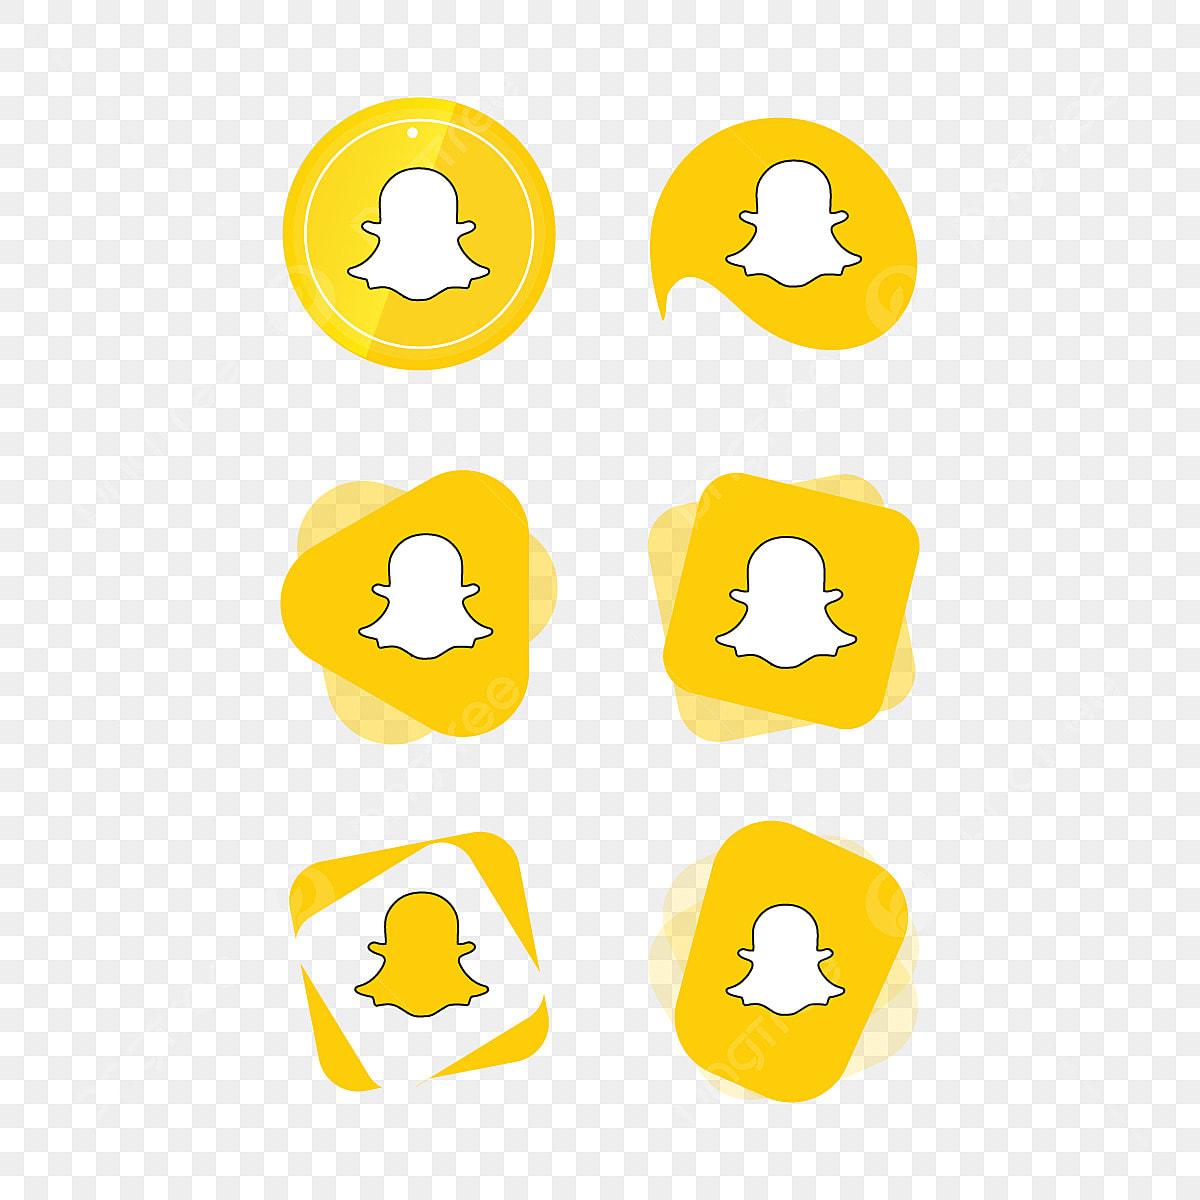 Snapchat المفاجئة الدردشة ايقونة شعار مجموعة مجموعة وسائل الاعلام الاجتماعية ناقلات المصور التطبيق أسود Png والمتجهات للتحميل مجانا